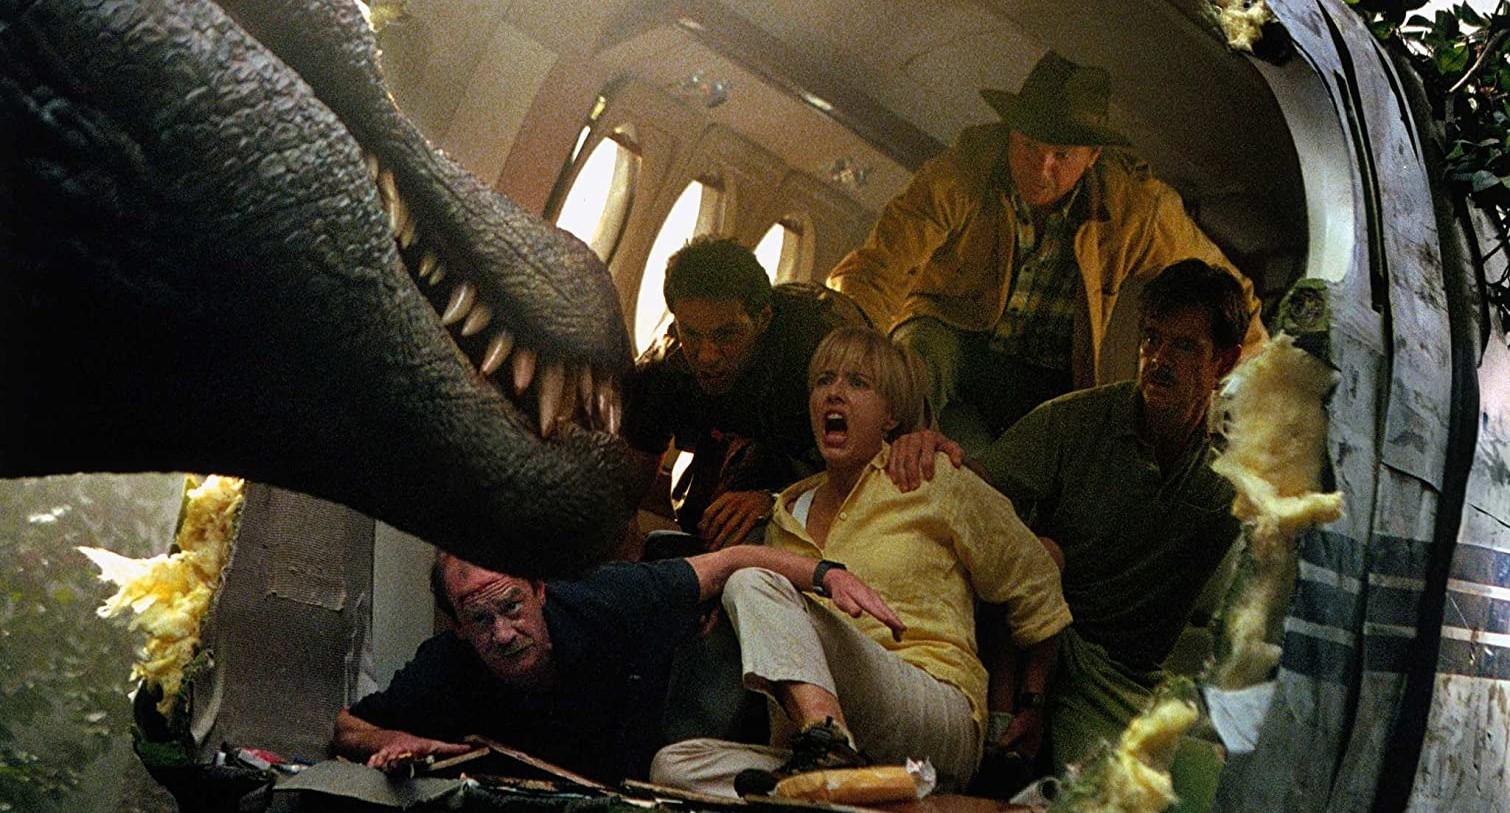 Jurassic Park Kino